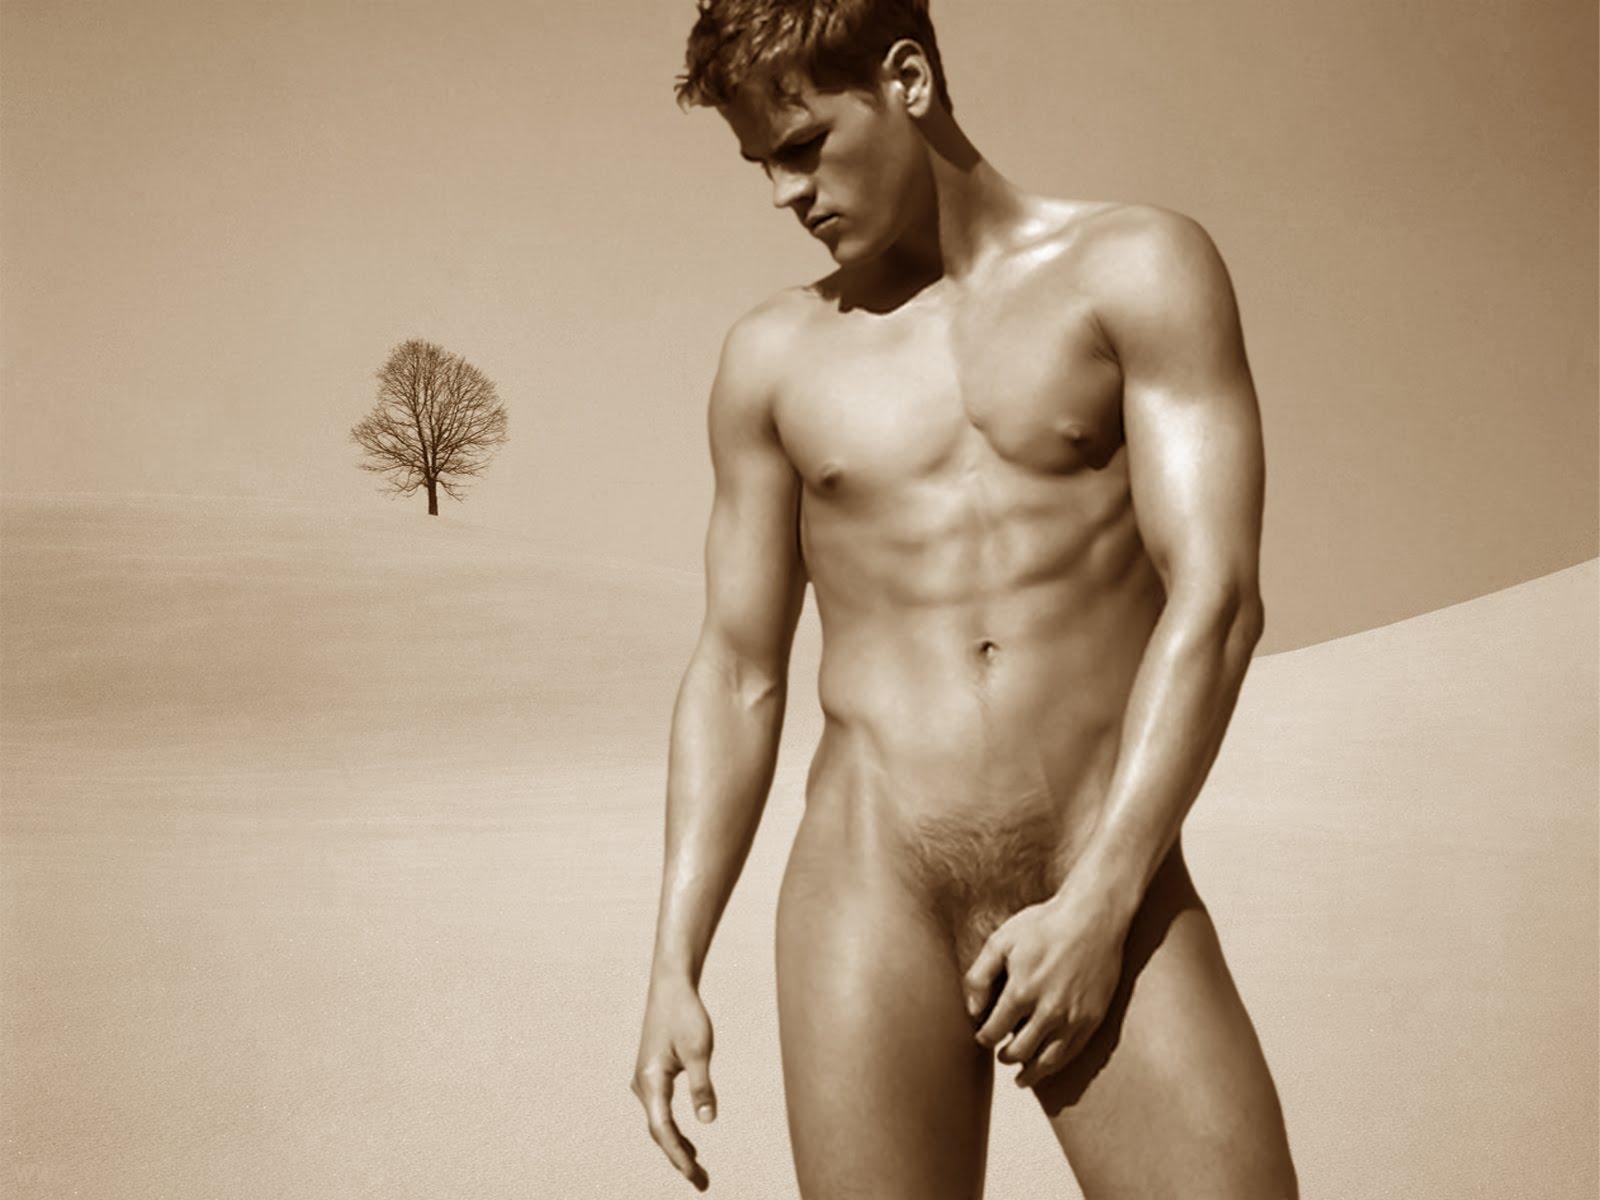 Sexy naked pics of dicks